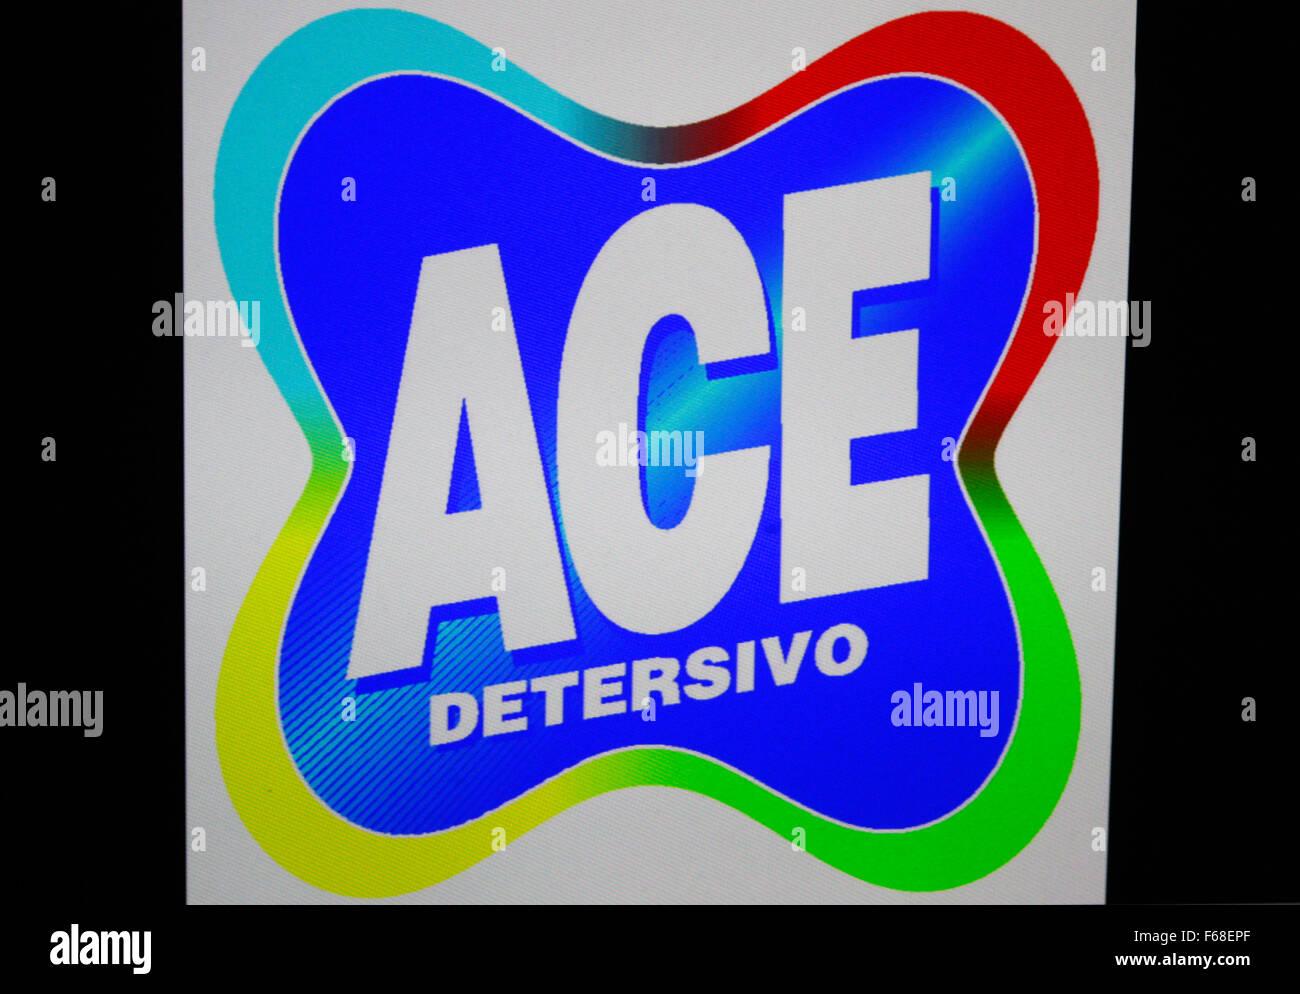 Markenname: 'Ace Detersivo', Berlin. - Stock Image